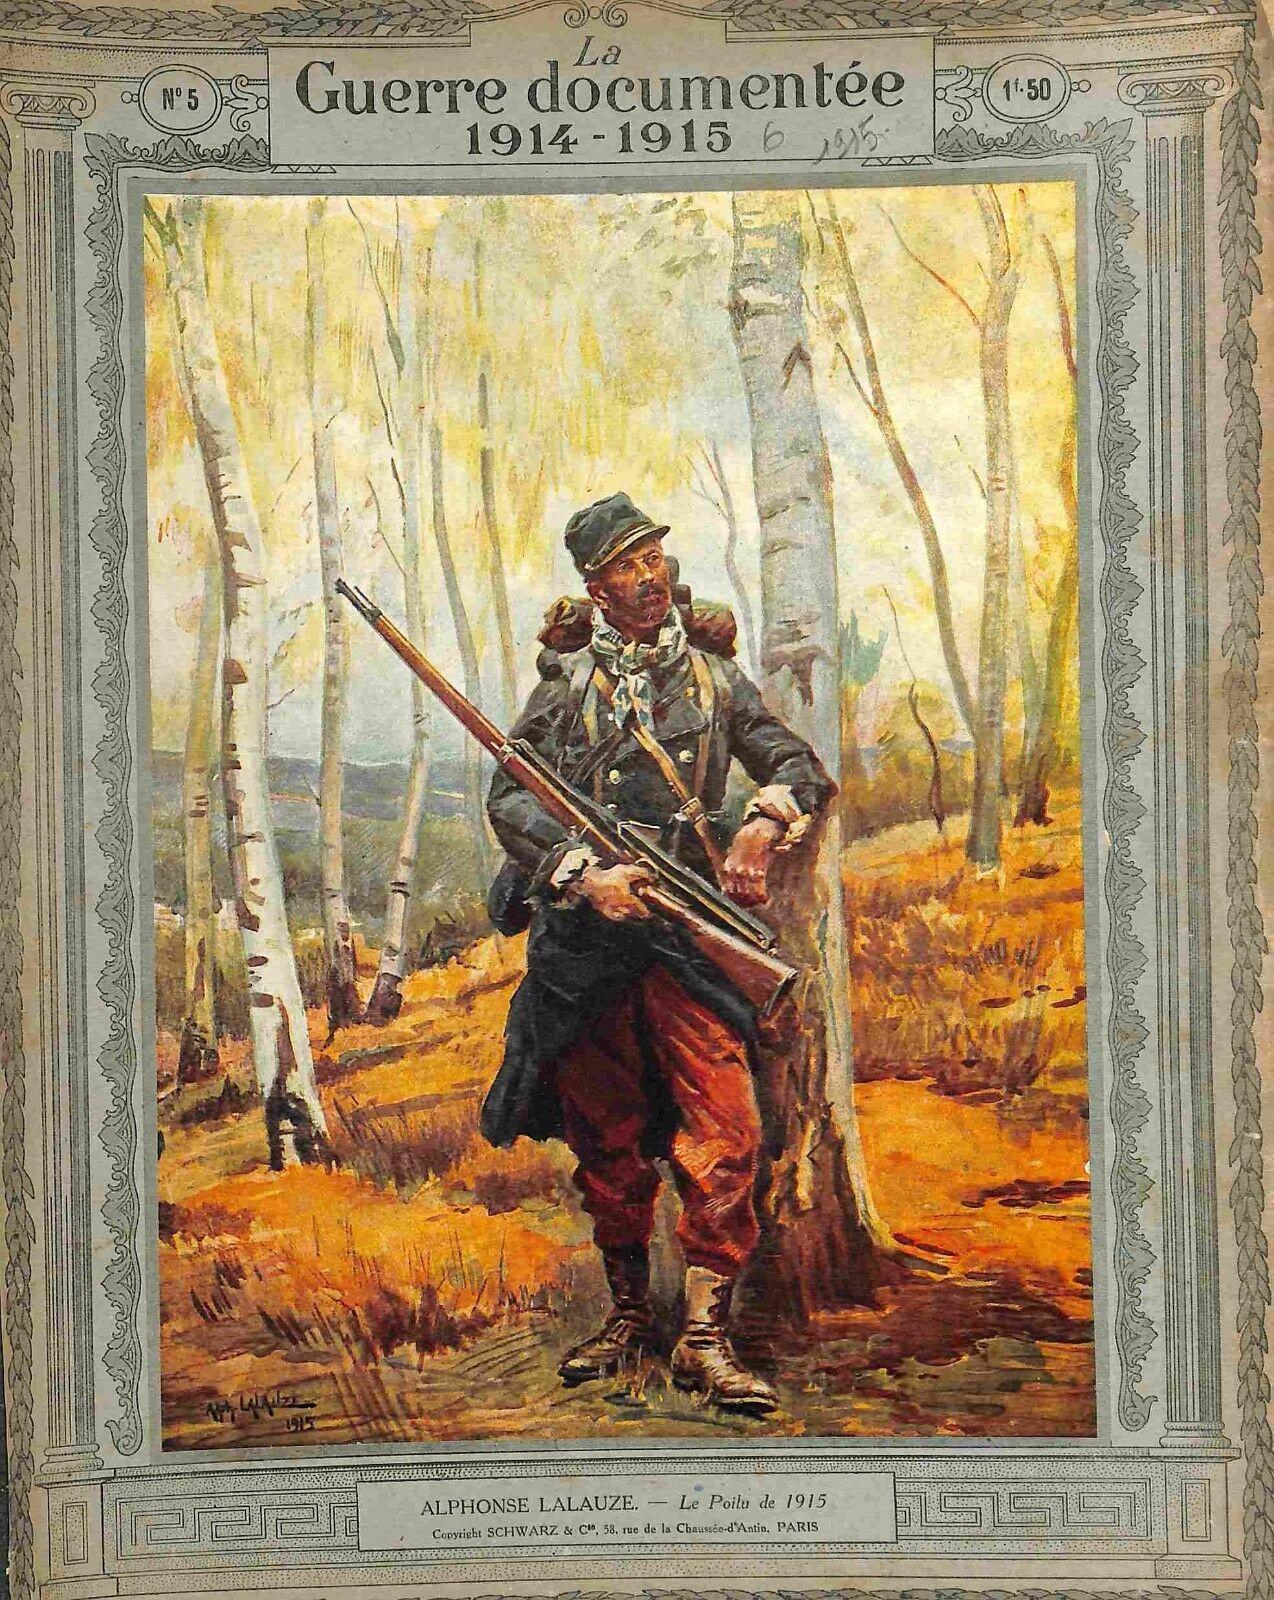 Alphonse Lalauze Poilu Soldat Uniforme Fusil Pantalon Rouge 1915 Wwi French Army Army France